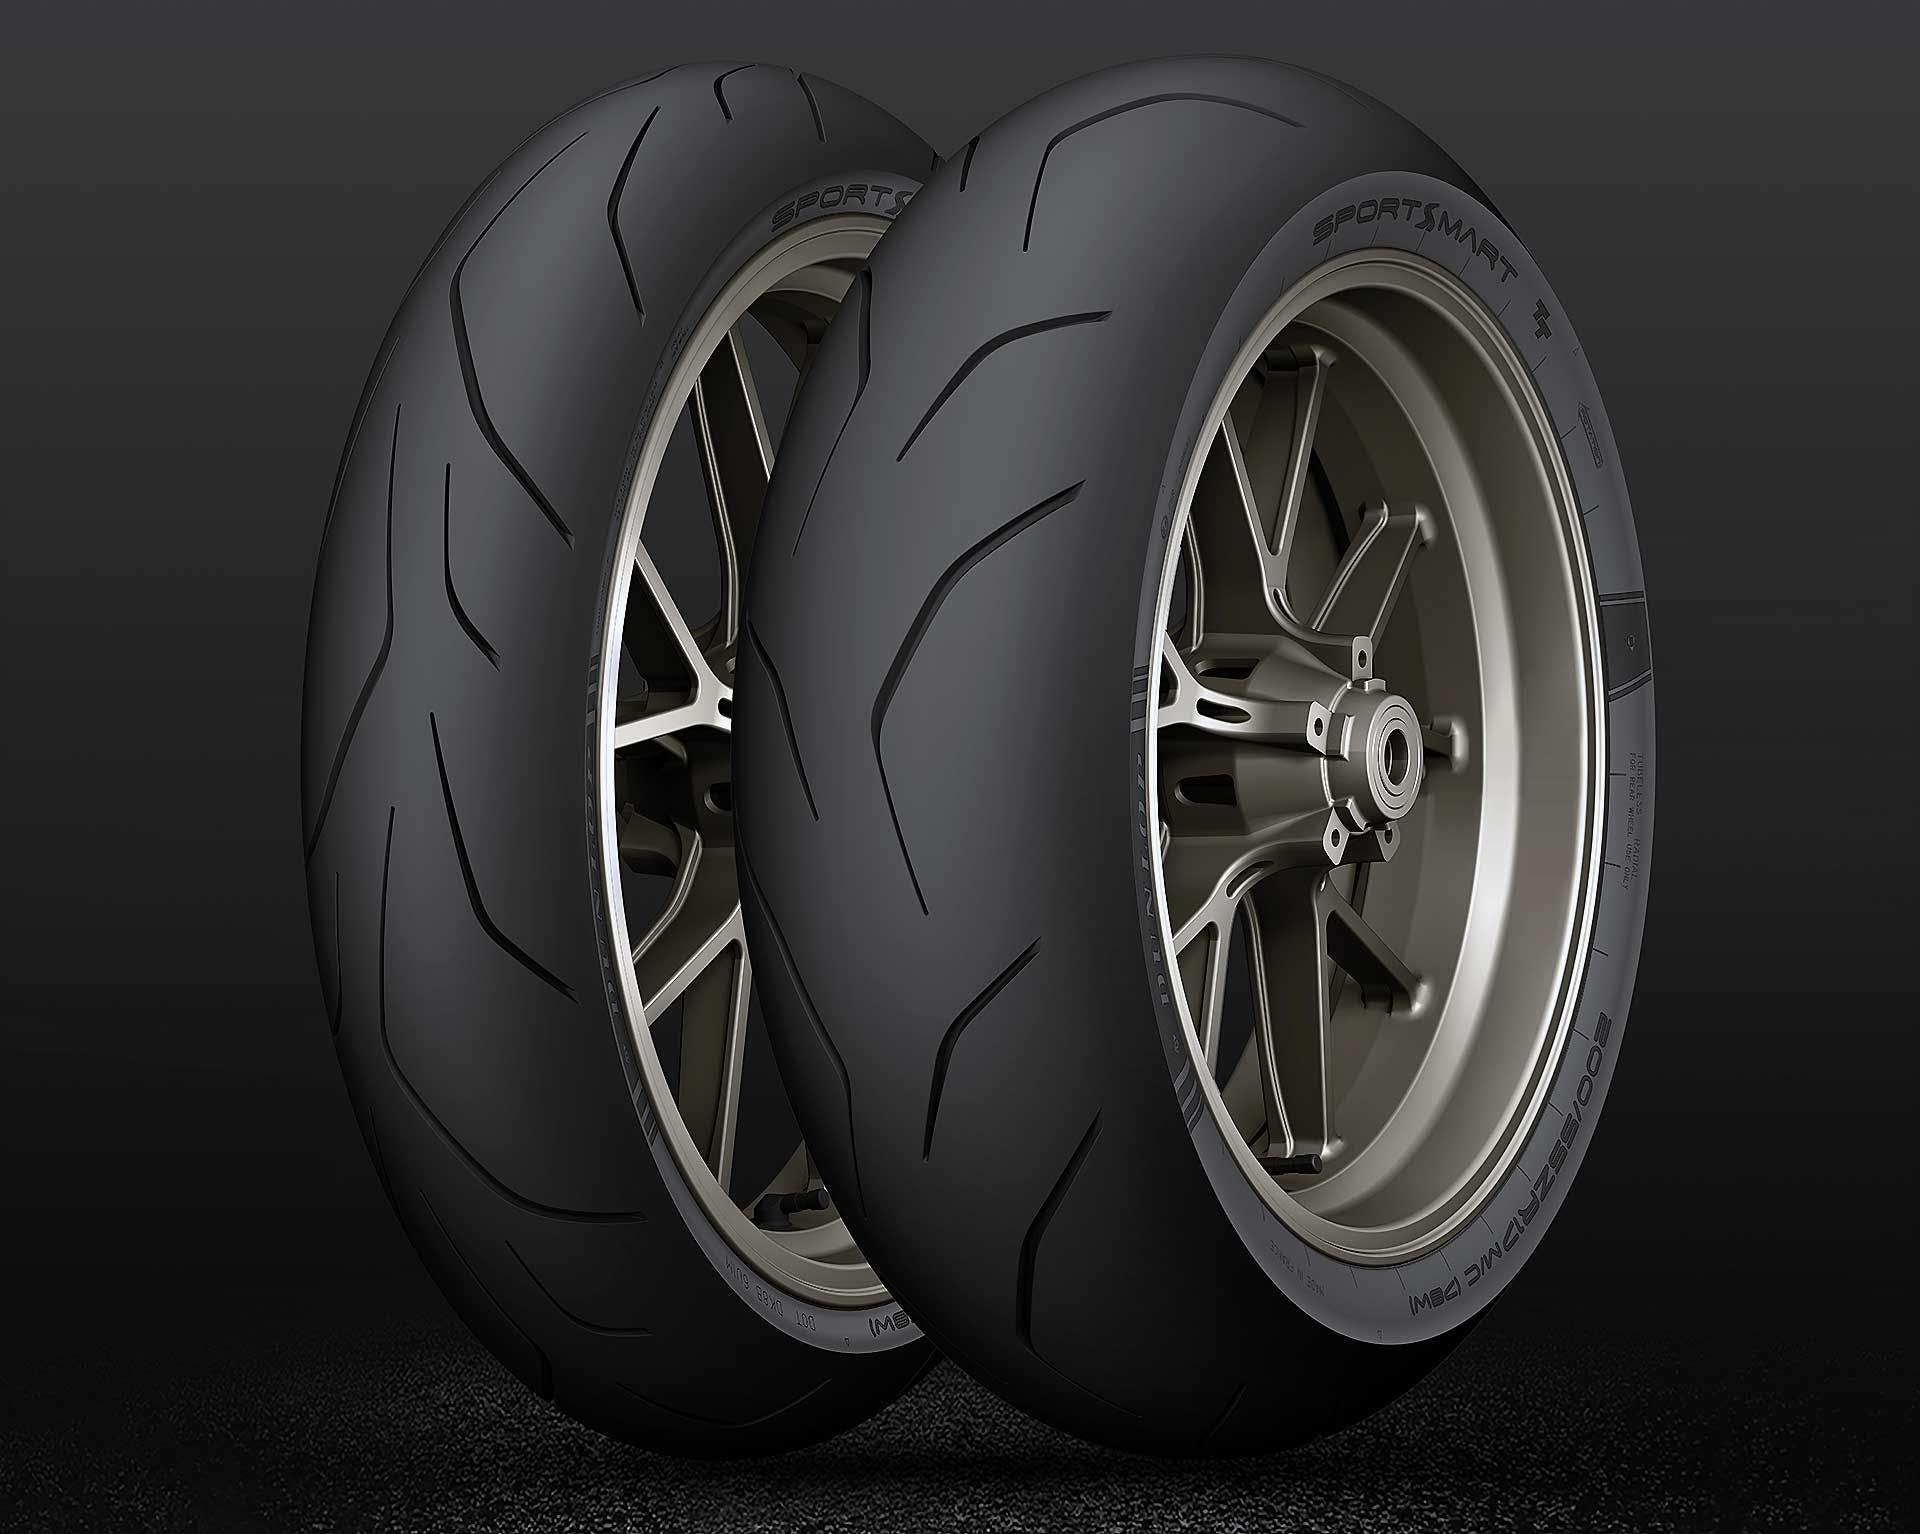 Dunlop SportSmart TT foto pneumatici